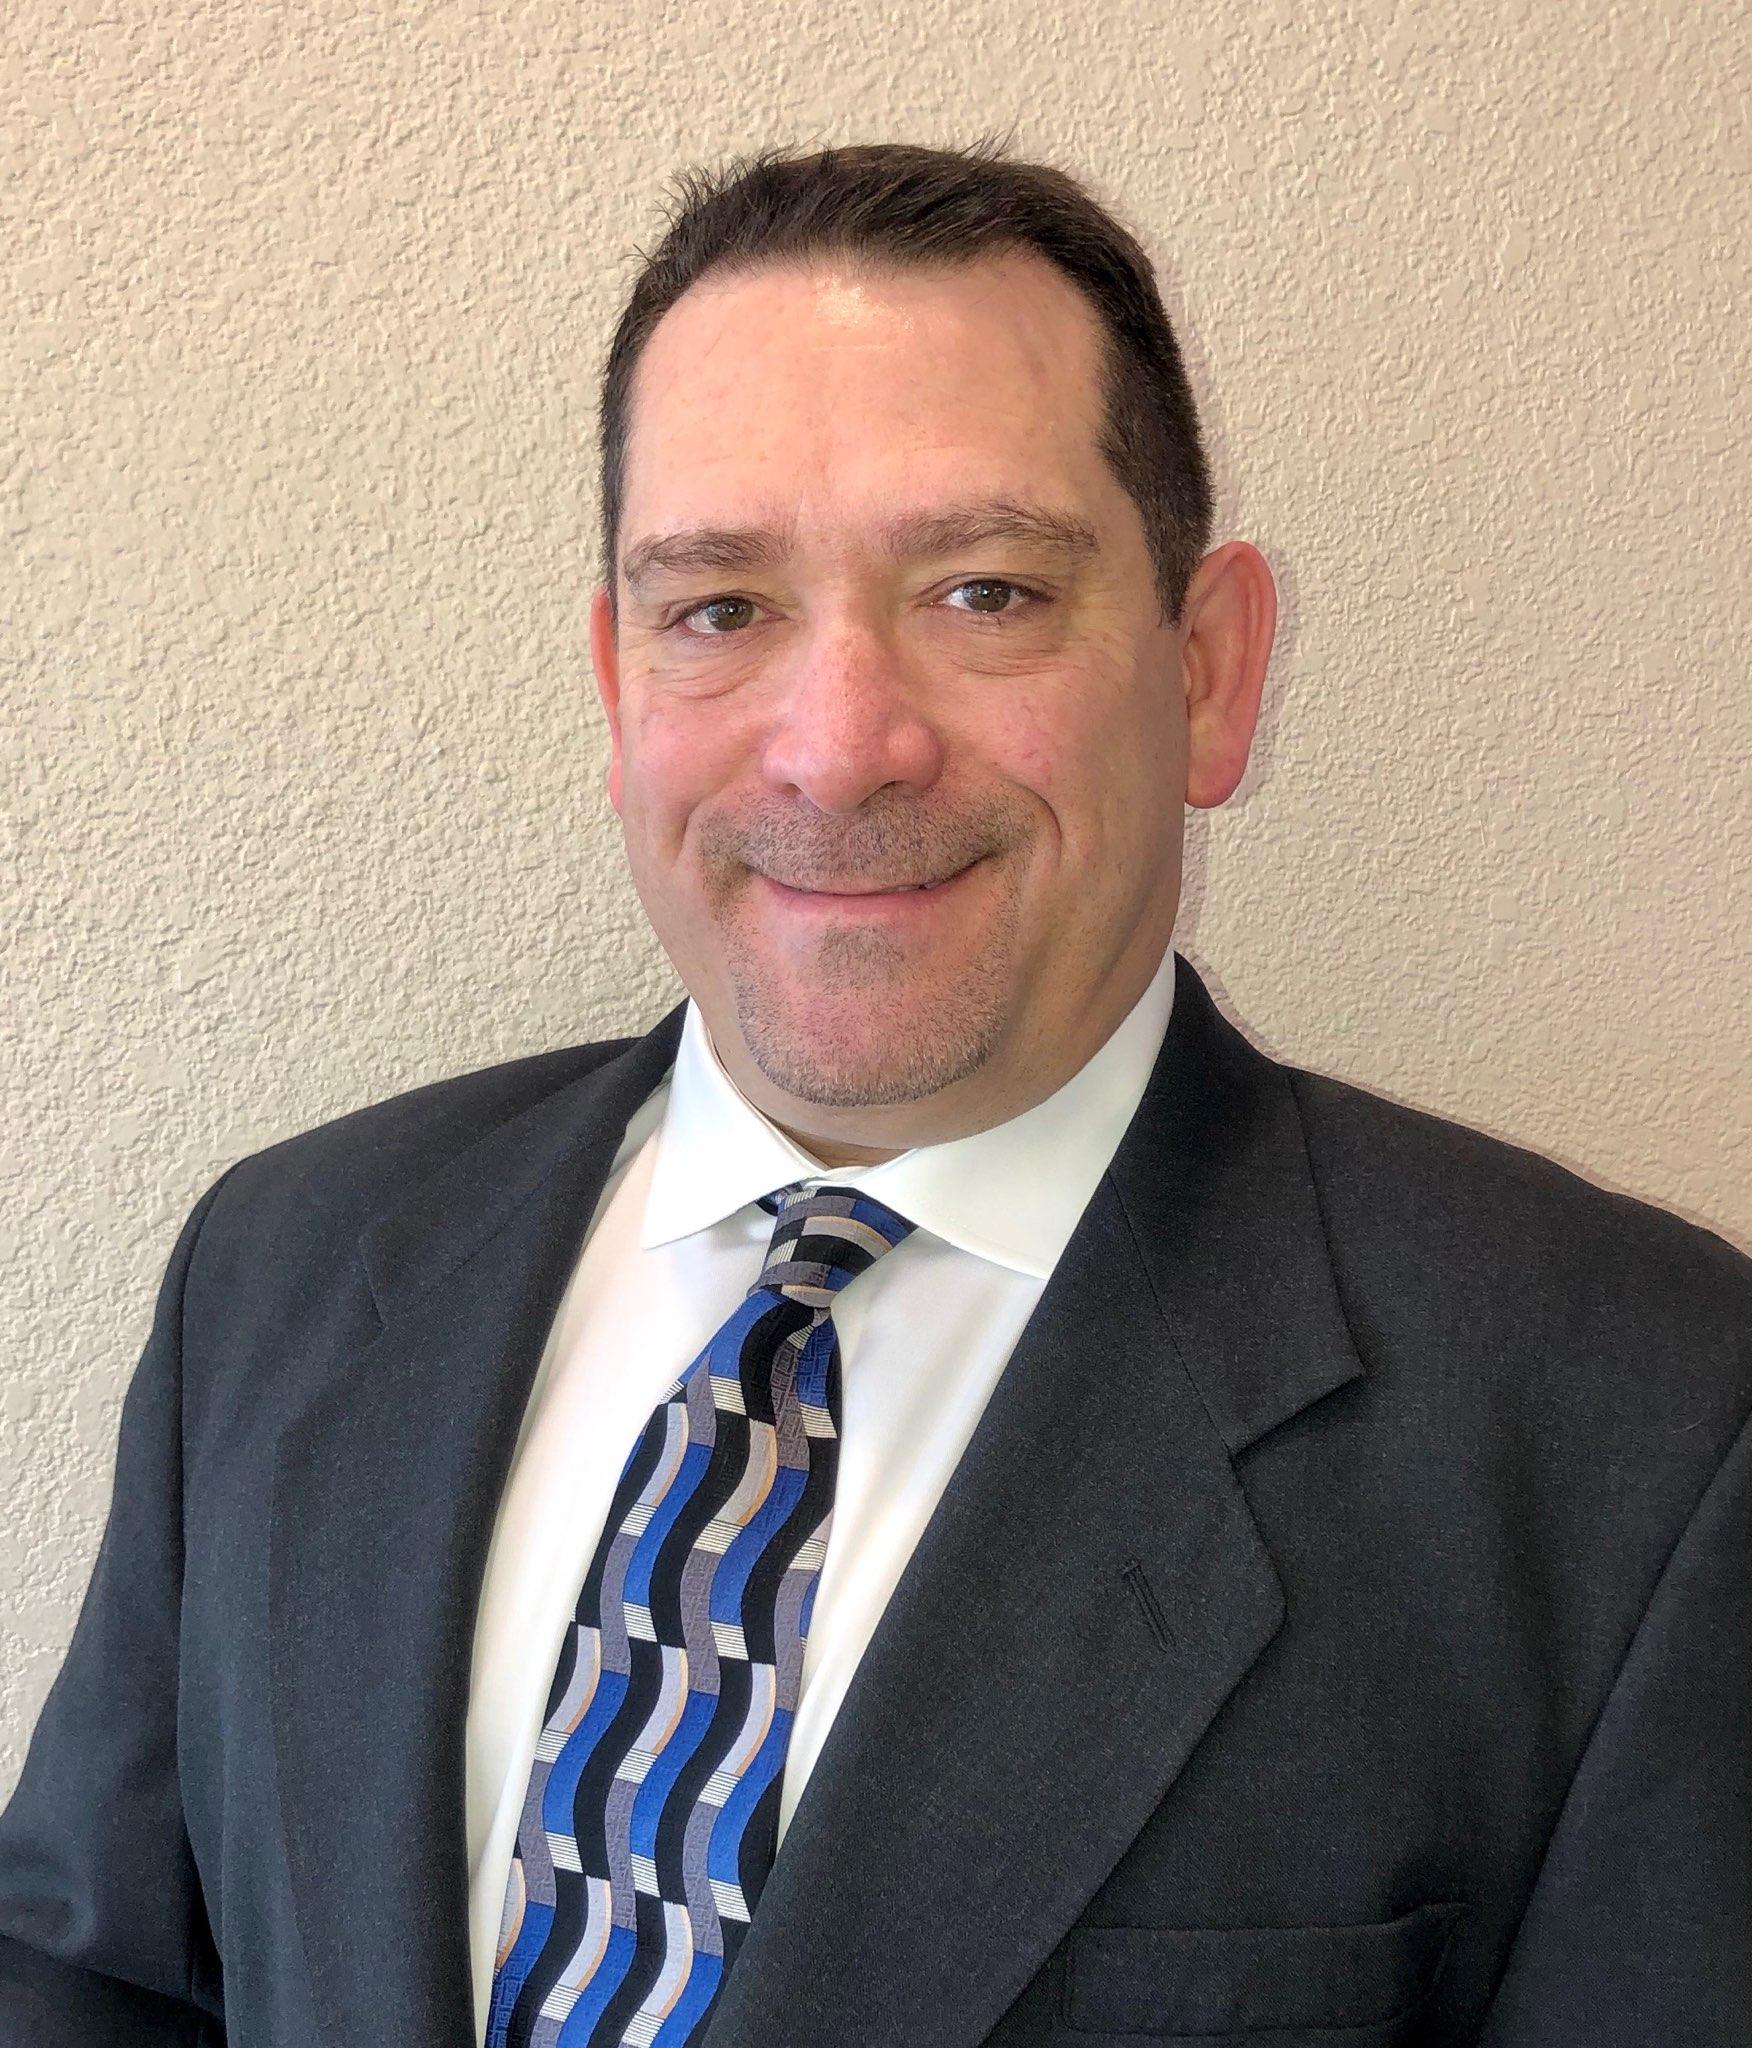 Martin Snocker Profile Image